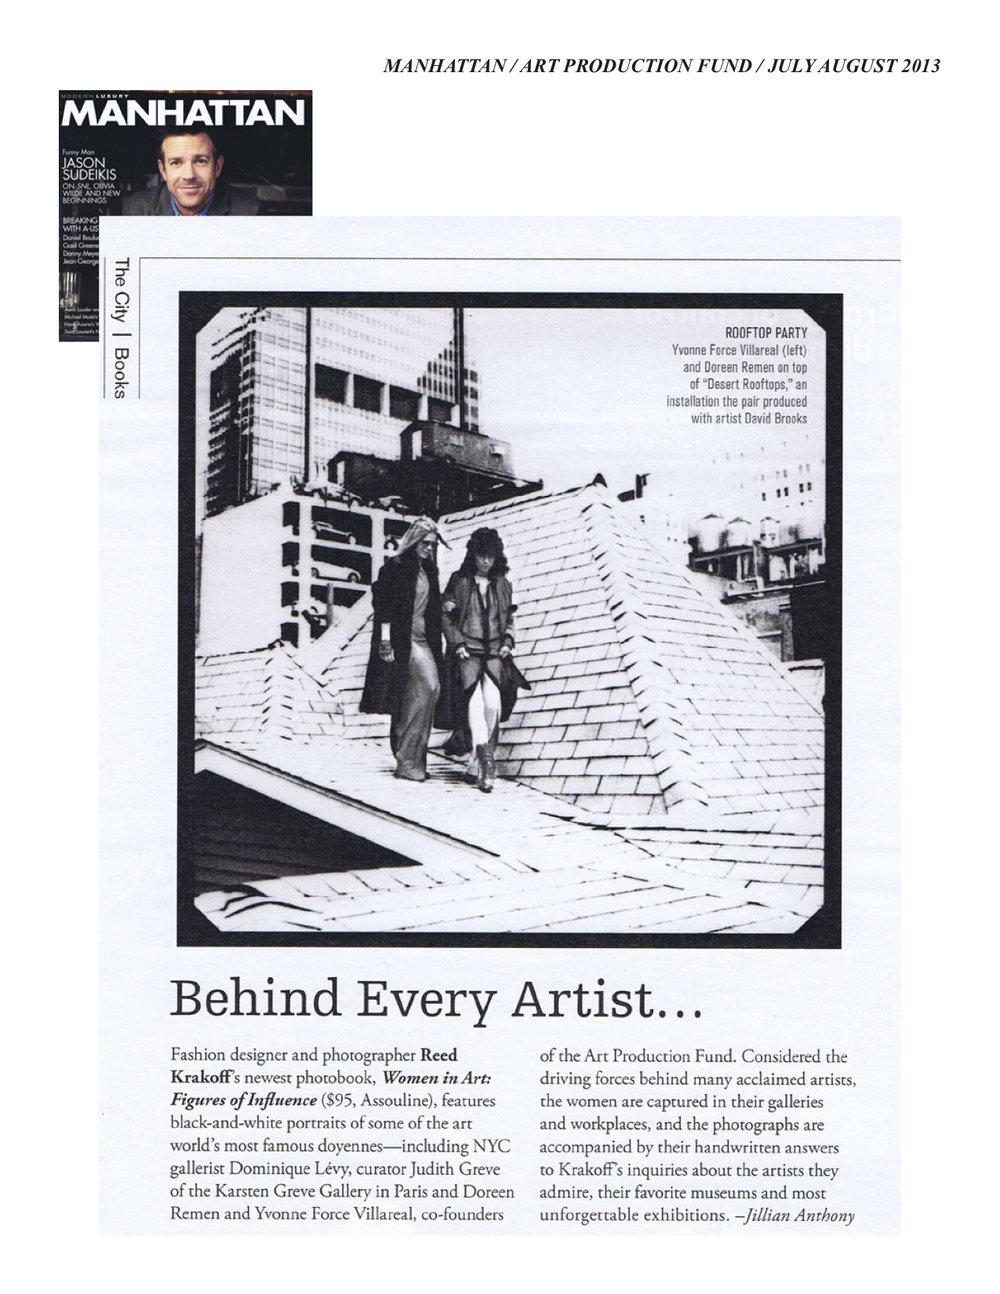 Manhattan_Art Production Fund_JulyAugust2013.jpg